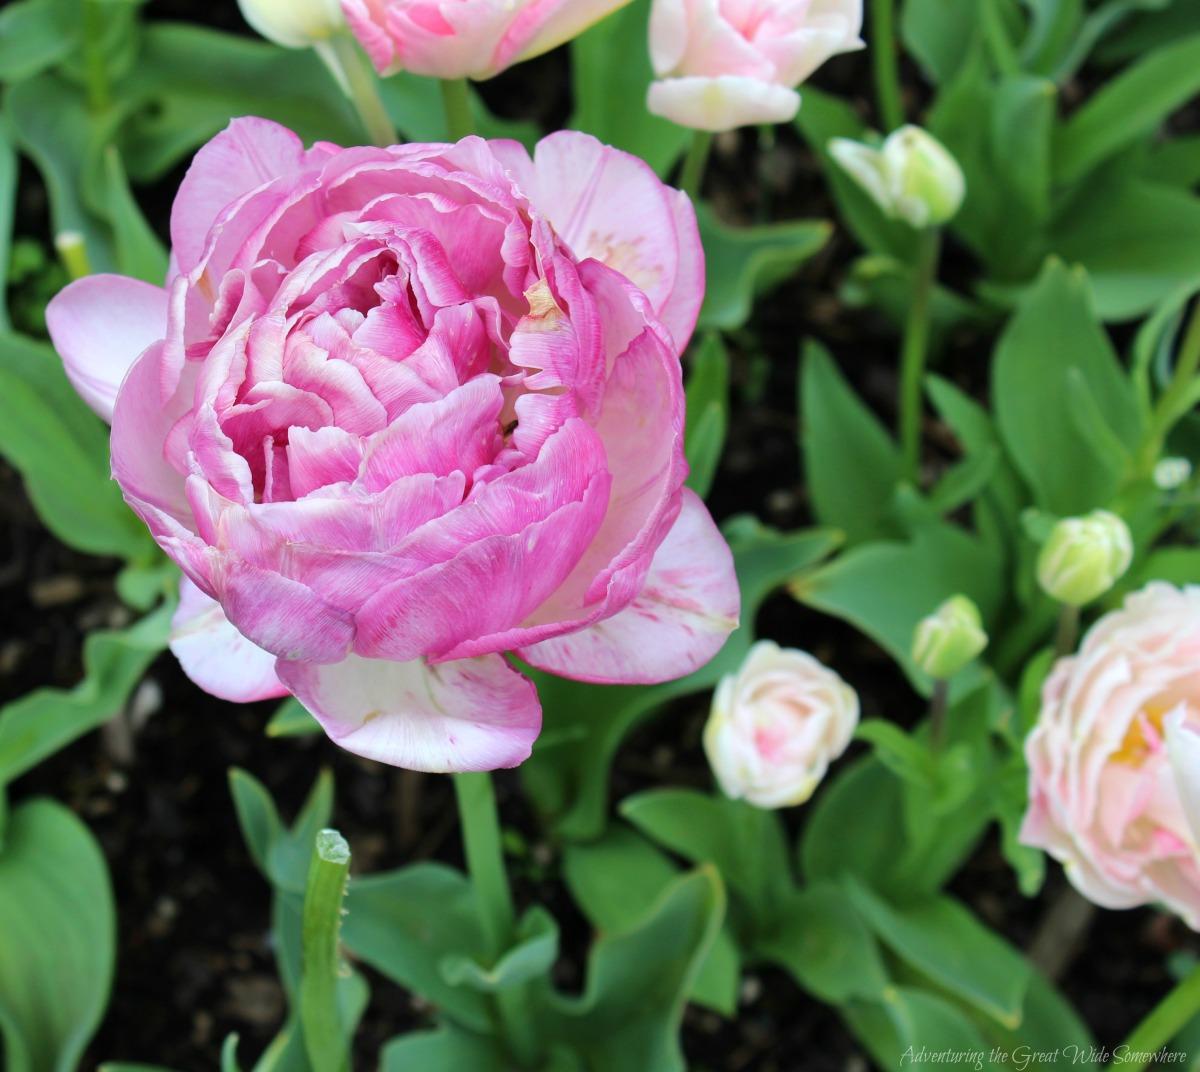 Beautiful Pink Tulip at Skagit Valley's Roozengaarde